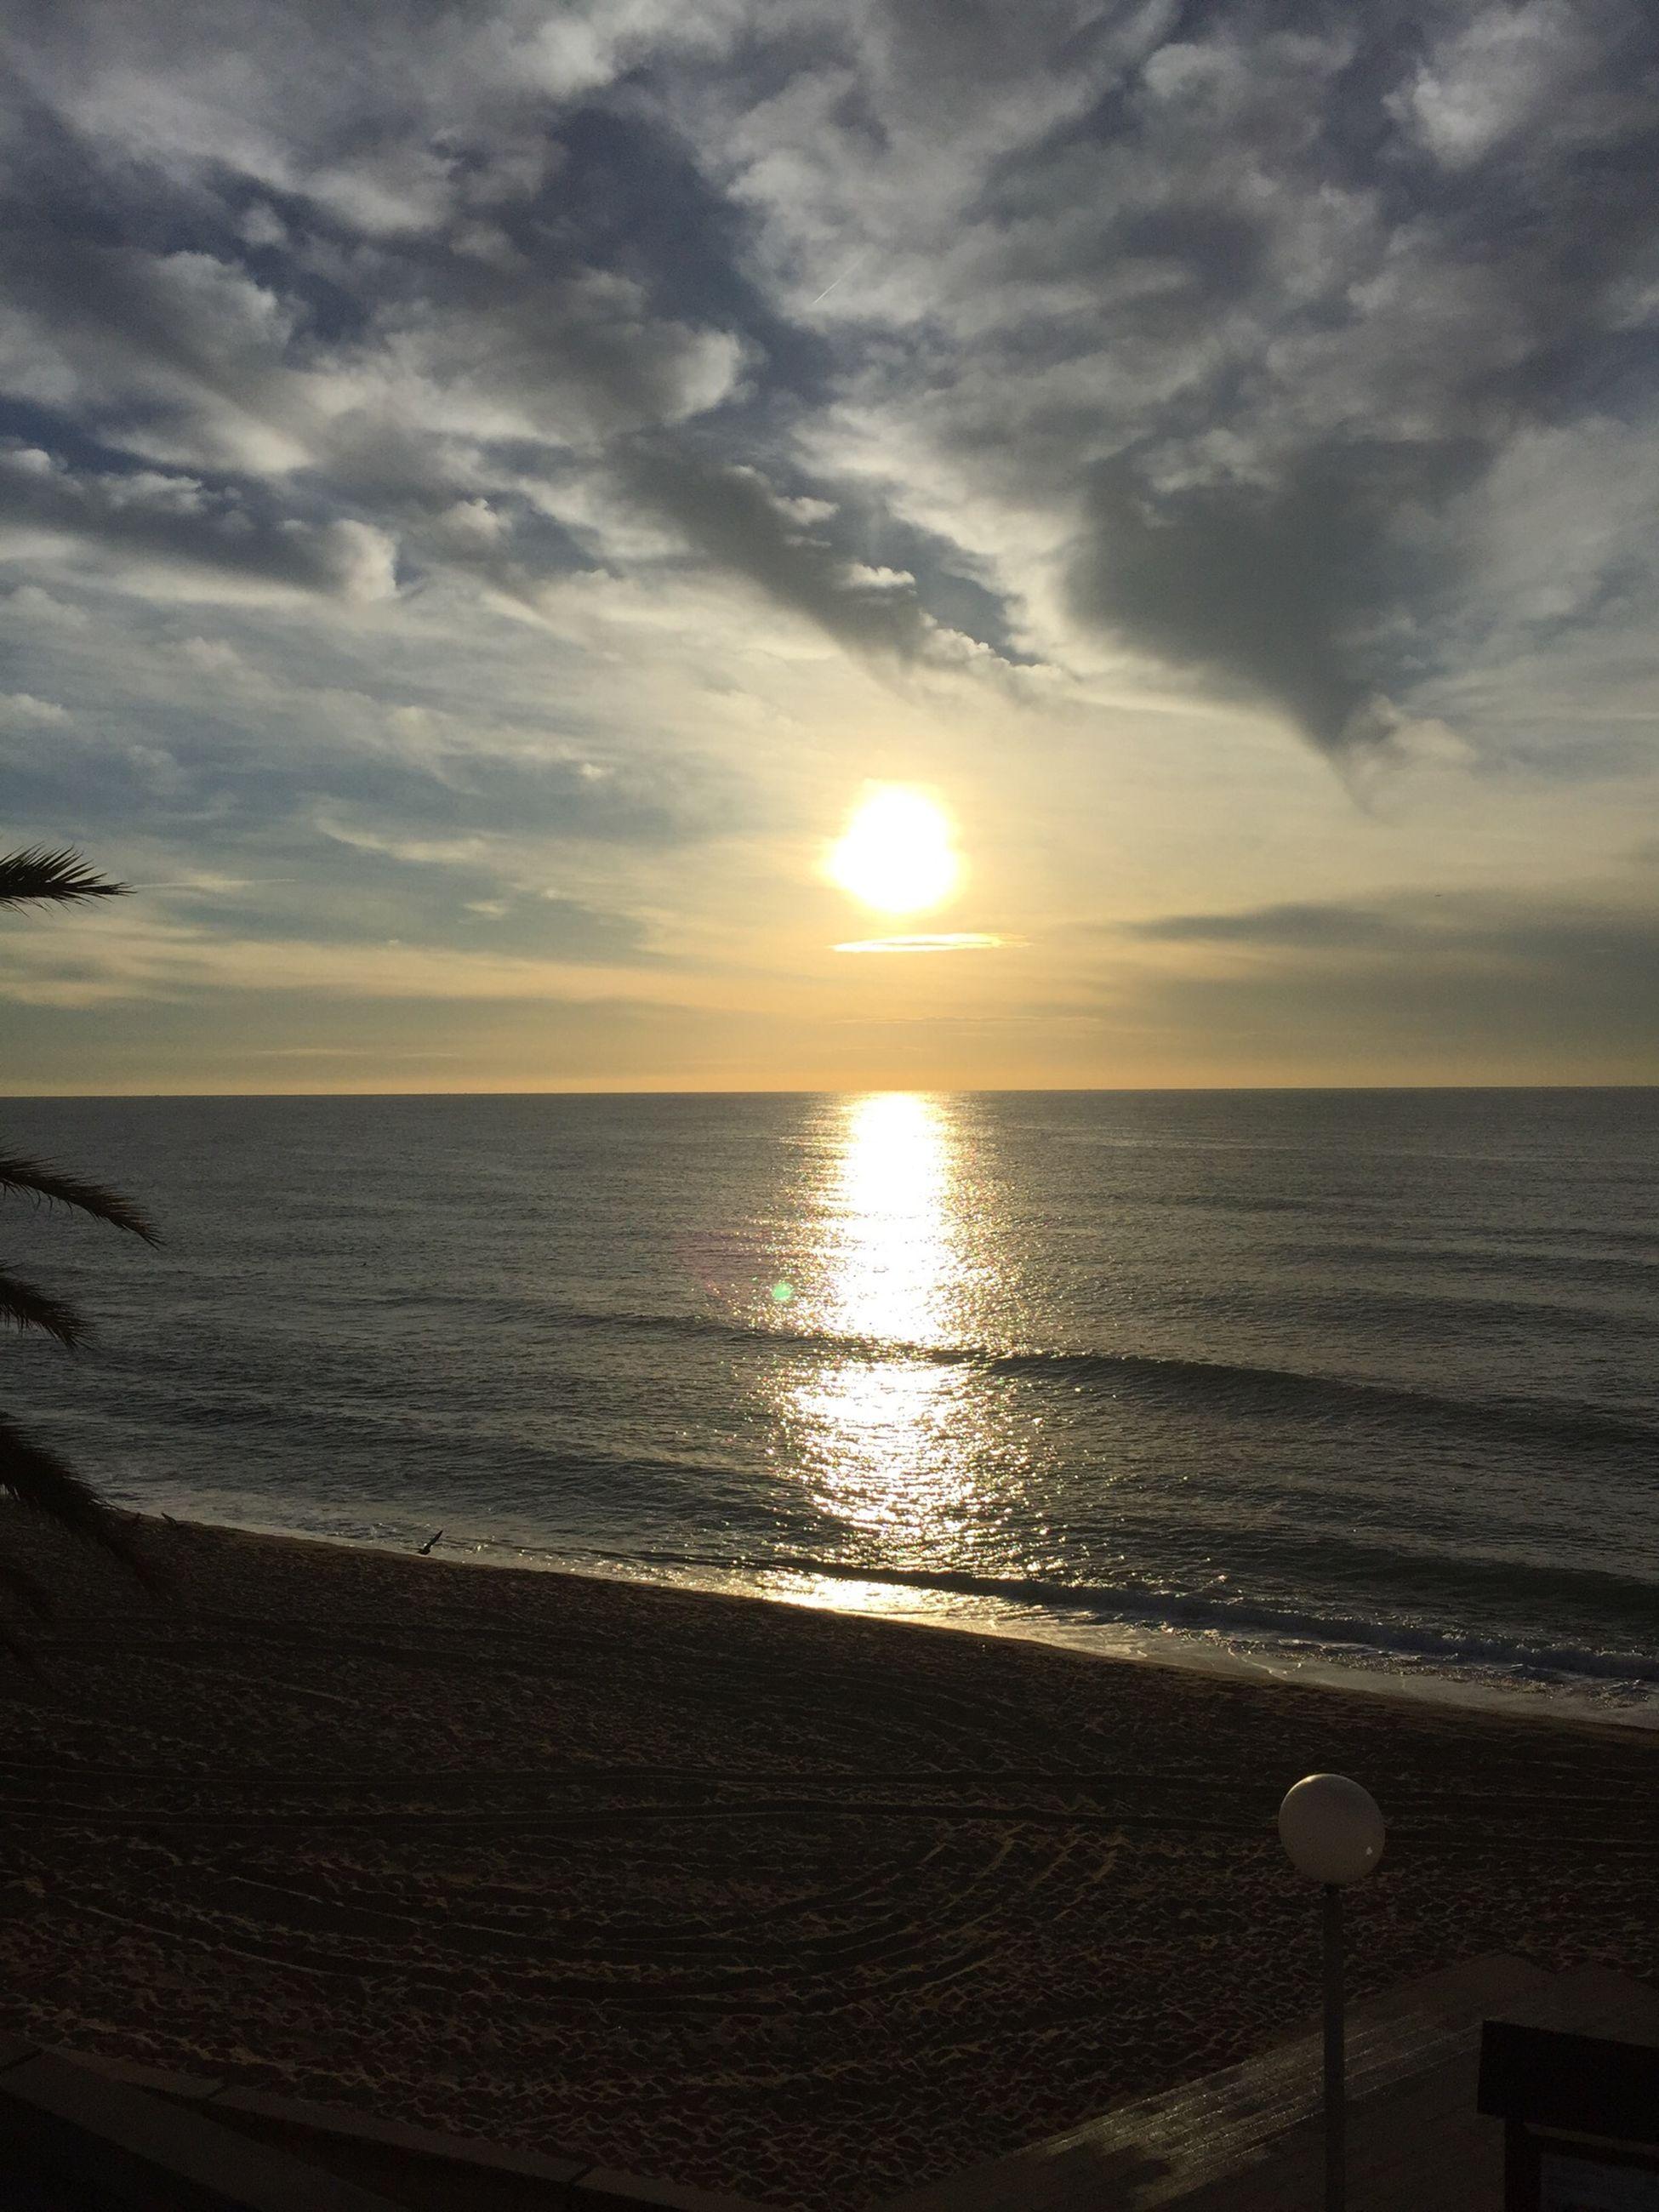 horizon over water, sea, water, beach, sunset, sky, scenics, tranquil scene, beauty in nature, sun, tranquility, shore, cloud - sky, idyllic, nature, reflection, cloud, sunlight, cloudy, seascape